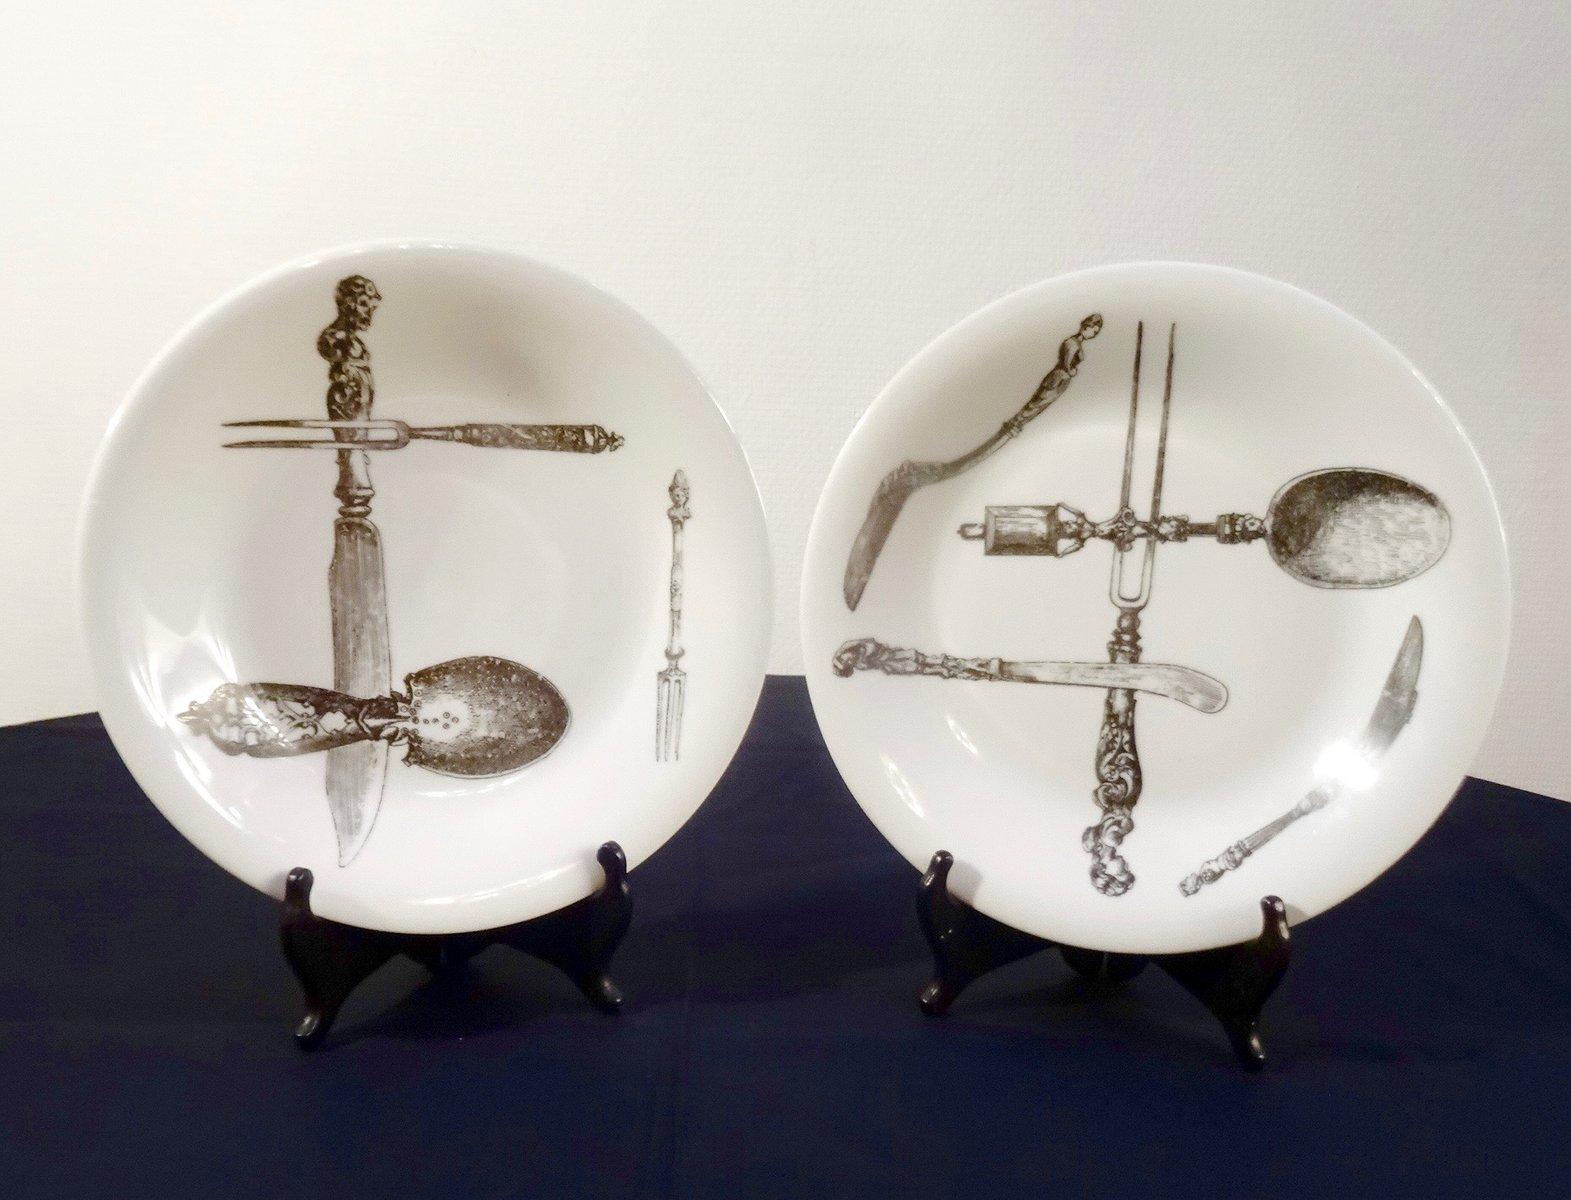 italienische porzellan teller von piero fornasetti f r atelier fornasetti 1950er 2er set bei. Black Bedroom Furniture Sets. Home Design Ideas